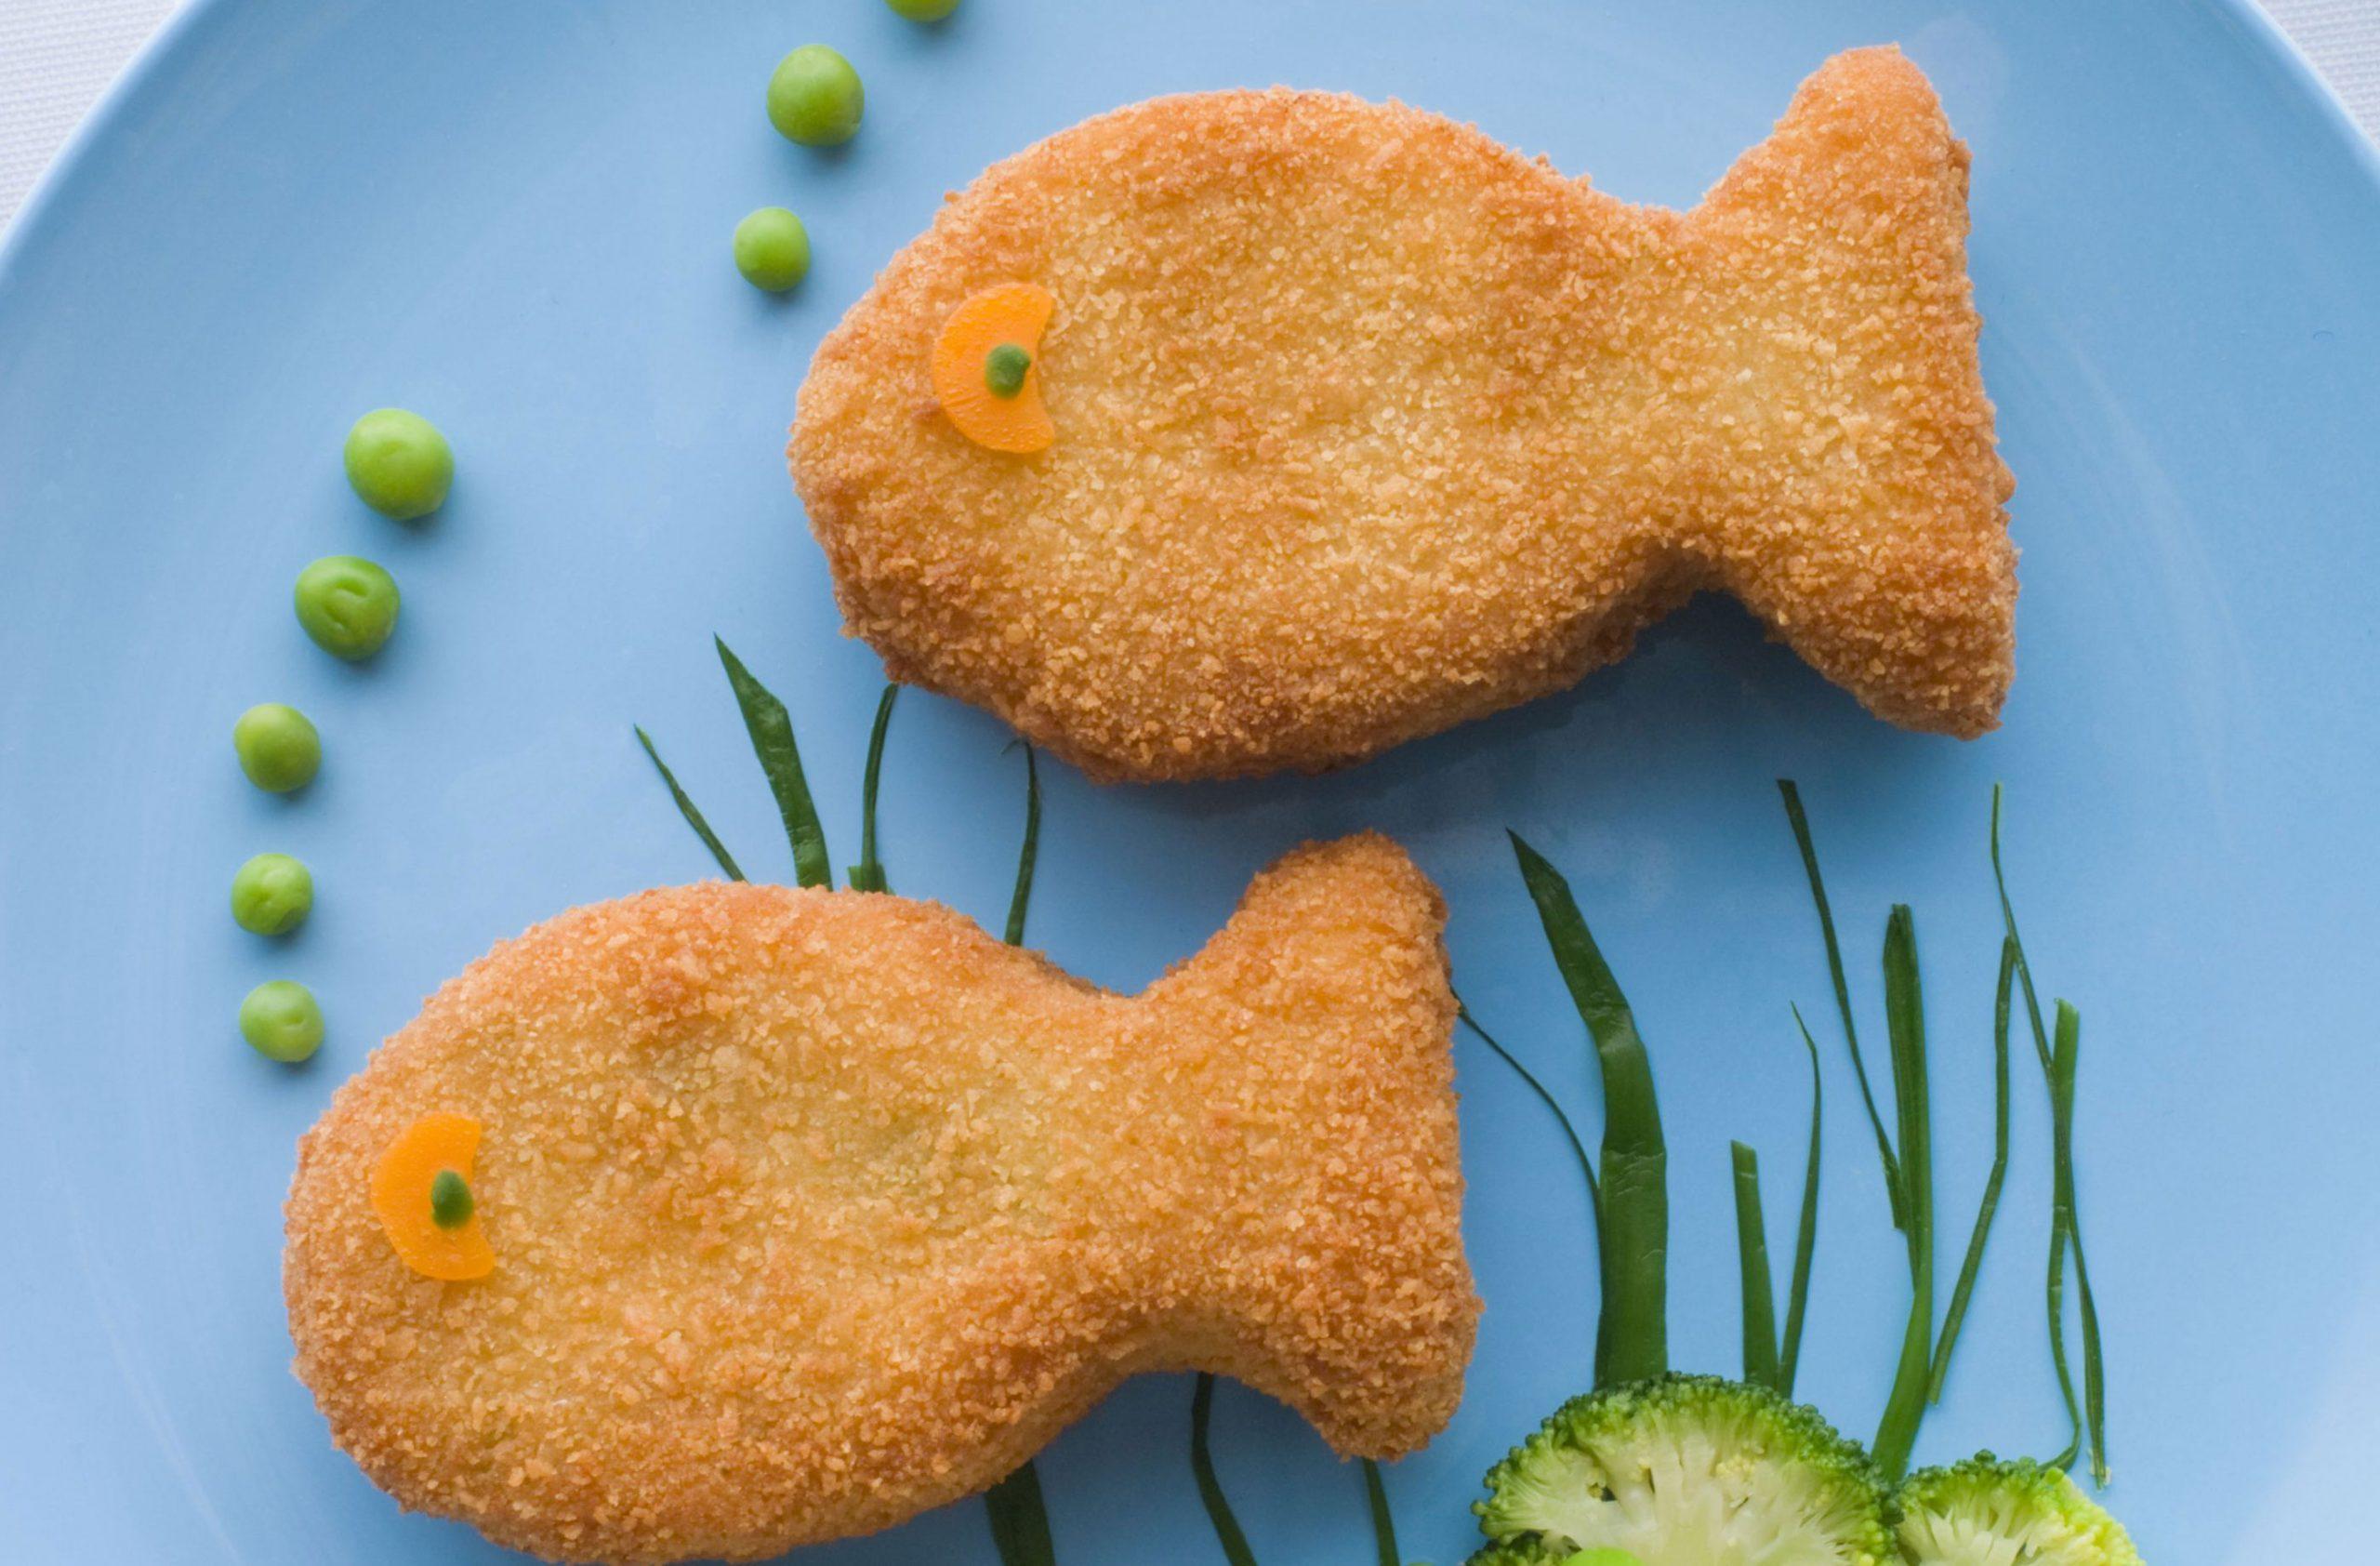 Annabel Karmel's salmon fishcakes